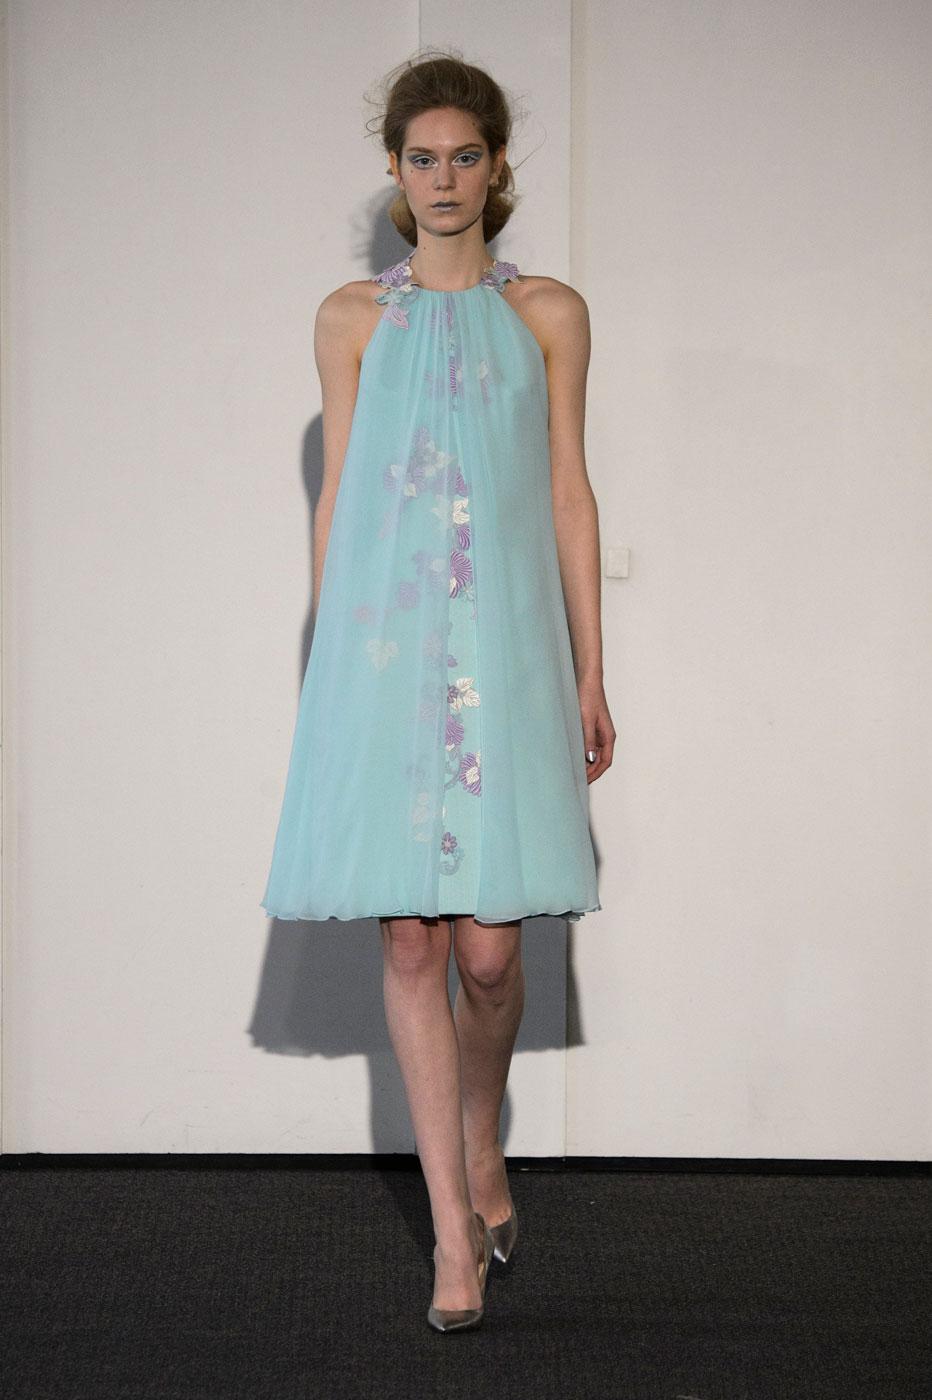 Busardi-fashion-runway-show-haute-couture-paris-spring-2015-the-impression-10